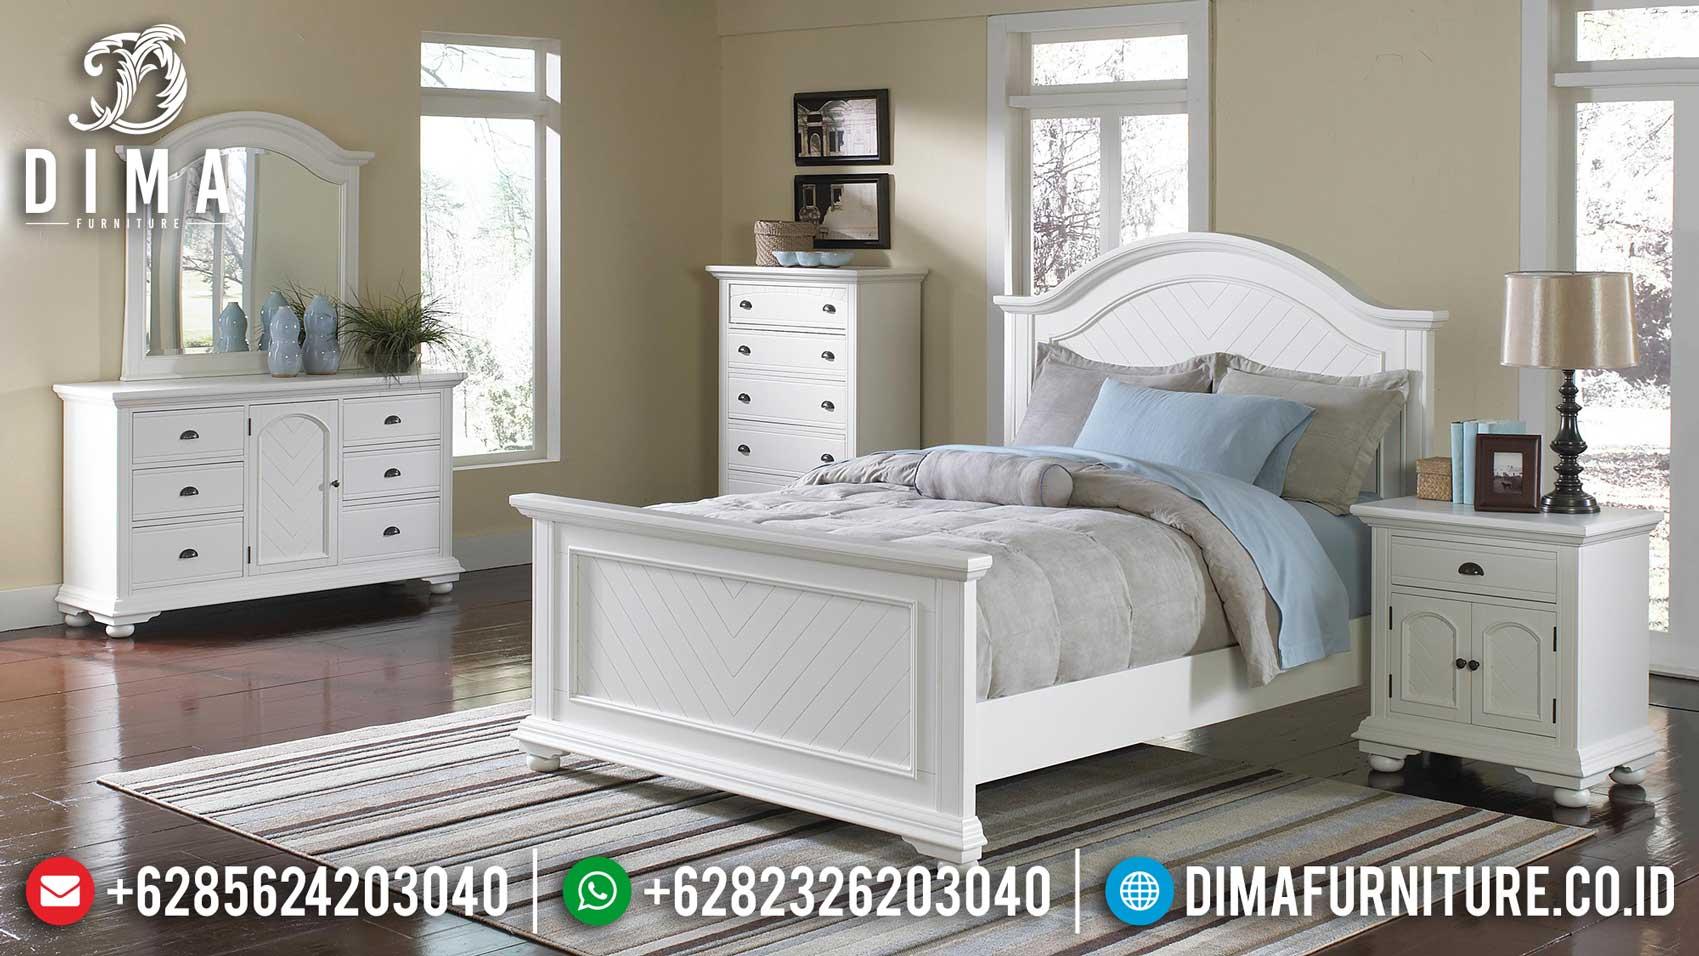 Harga Tempat Tidur Minimalis Putih Duco New Year Edition Item TTJ-1125